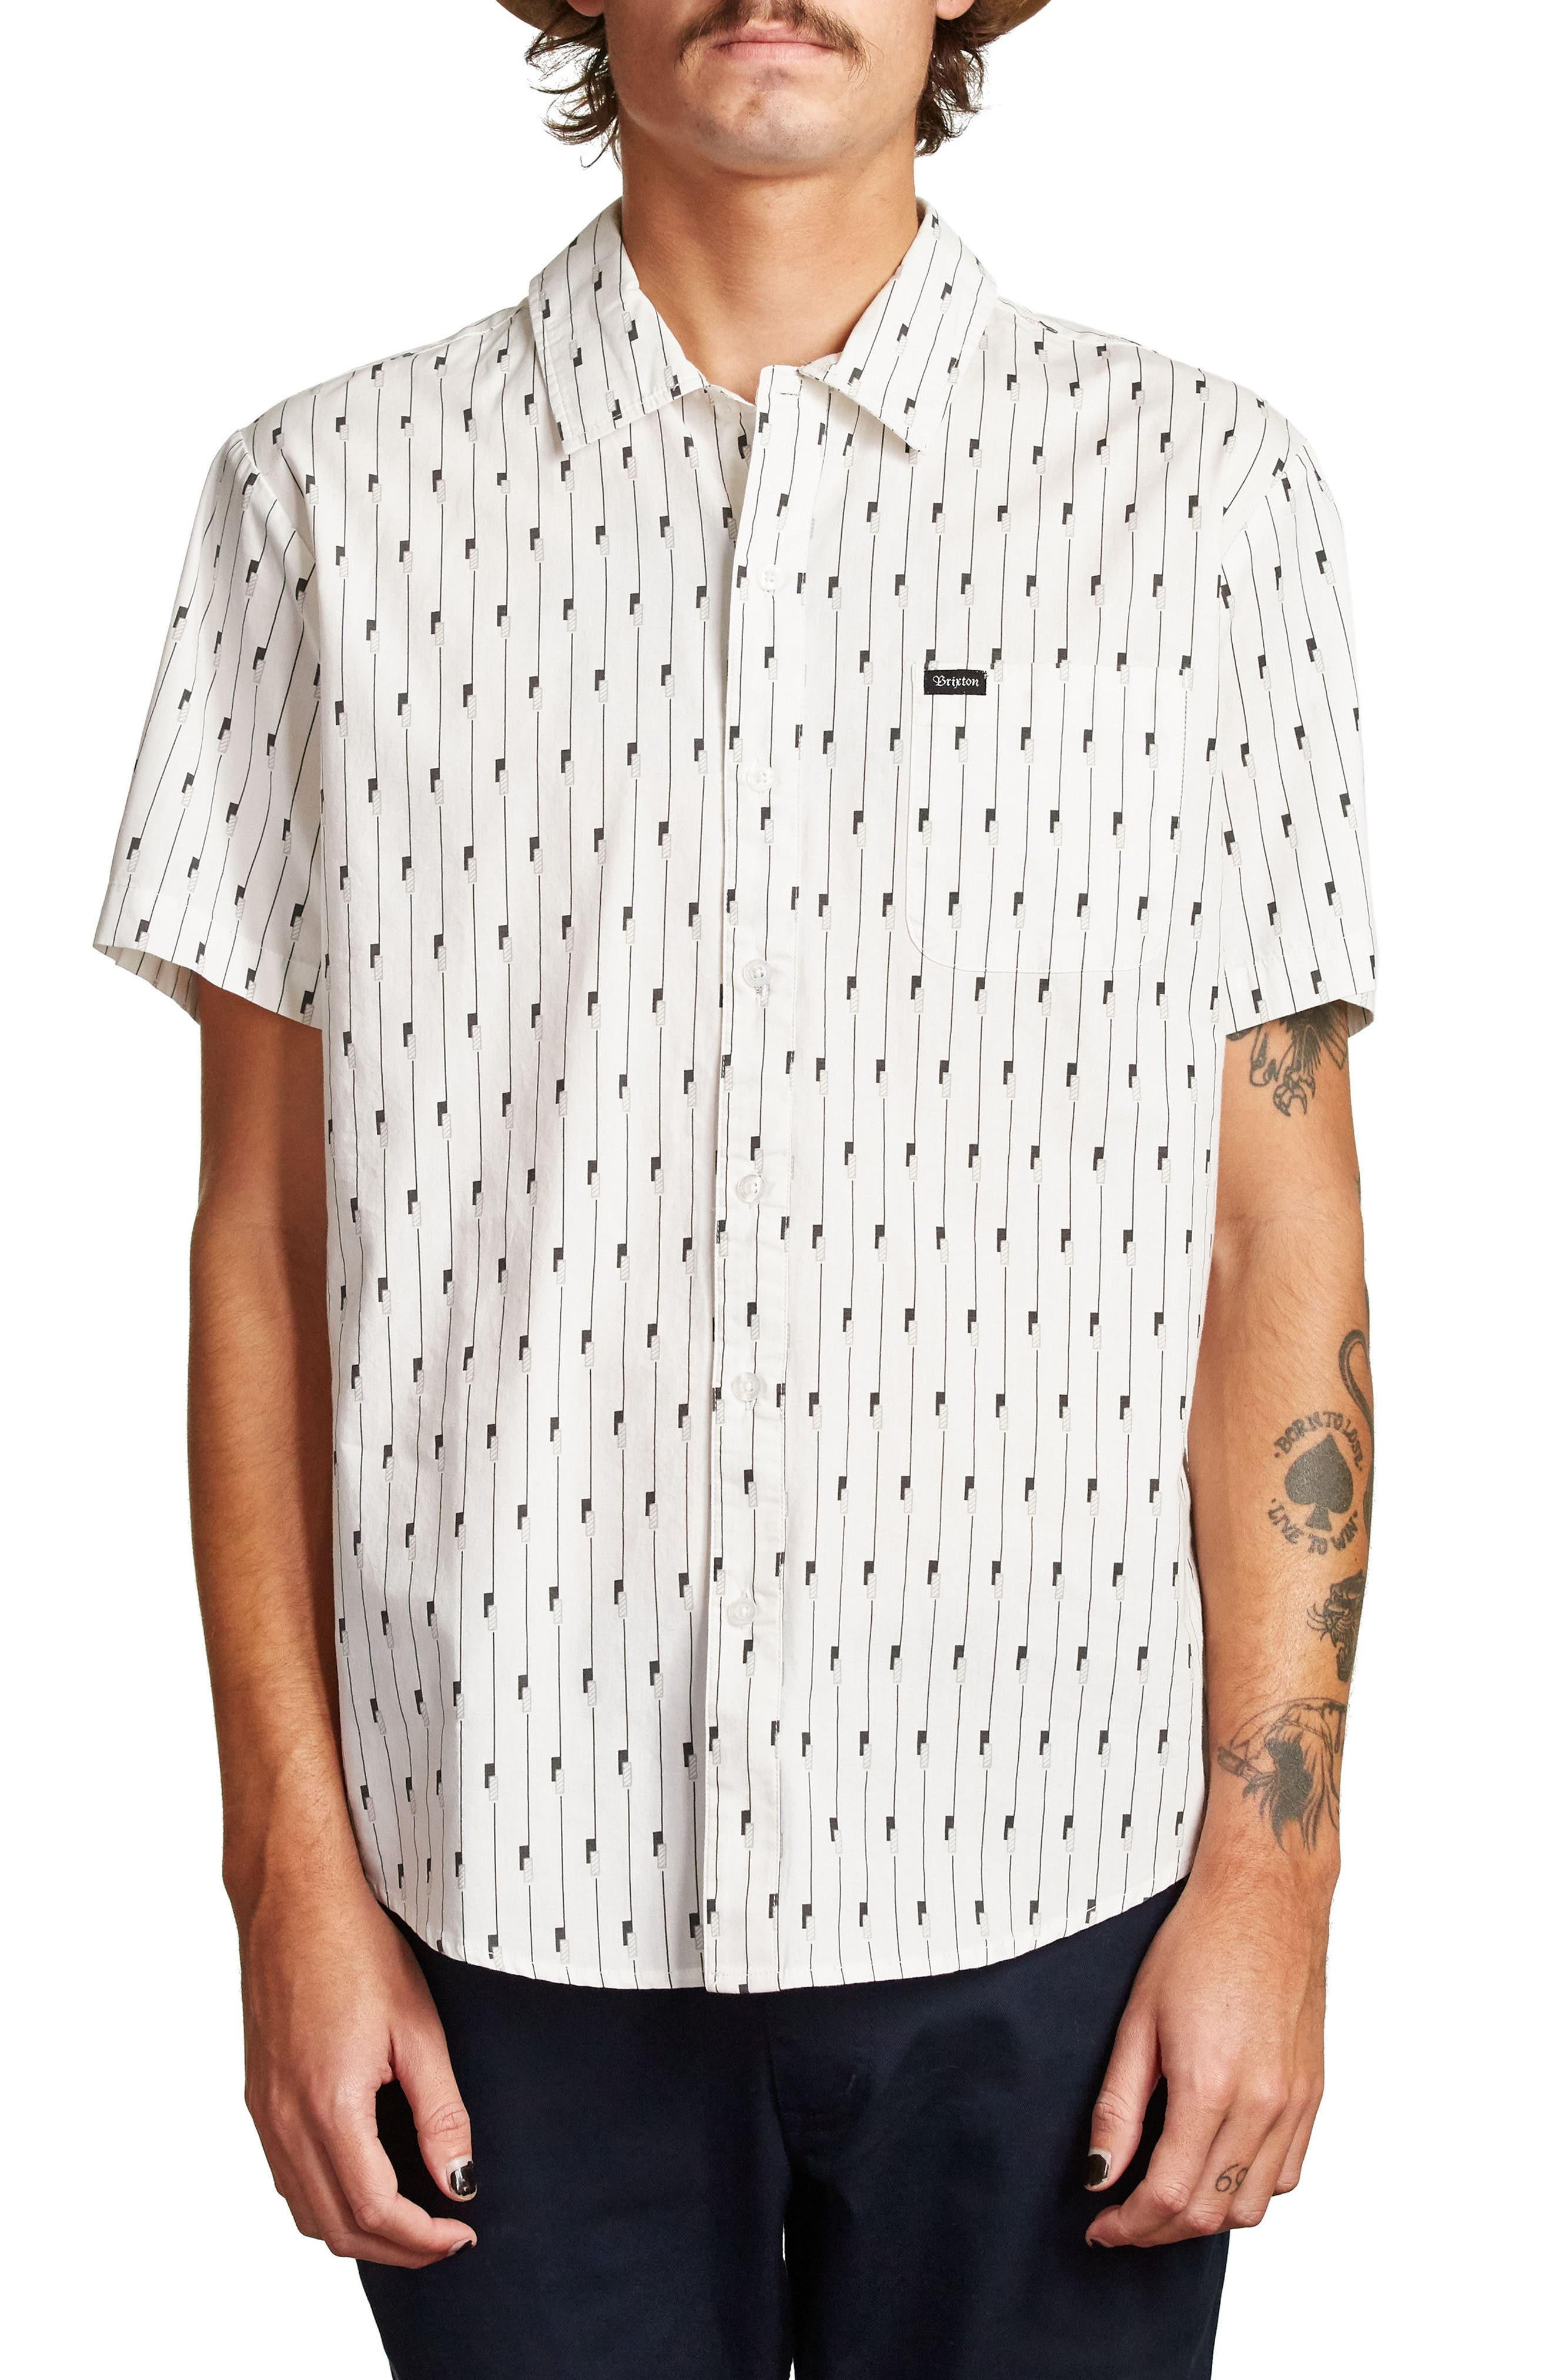 Charter Woven Shirt,                             Main thumbnail 1, color,                             100